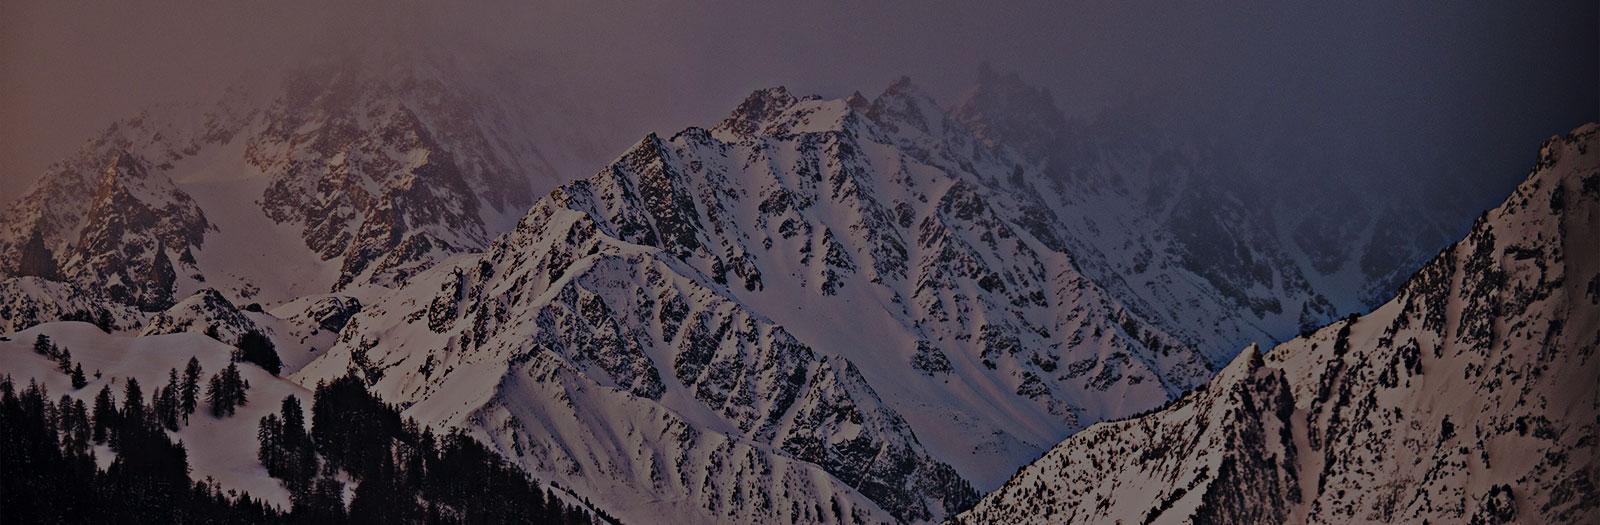 World ski atlas, ski resorts across the world, where can you ski in the world, ski vacations, ski resorts, ski package